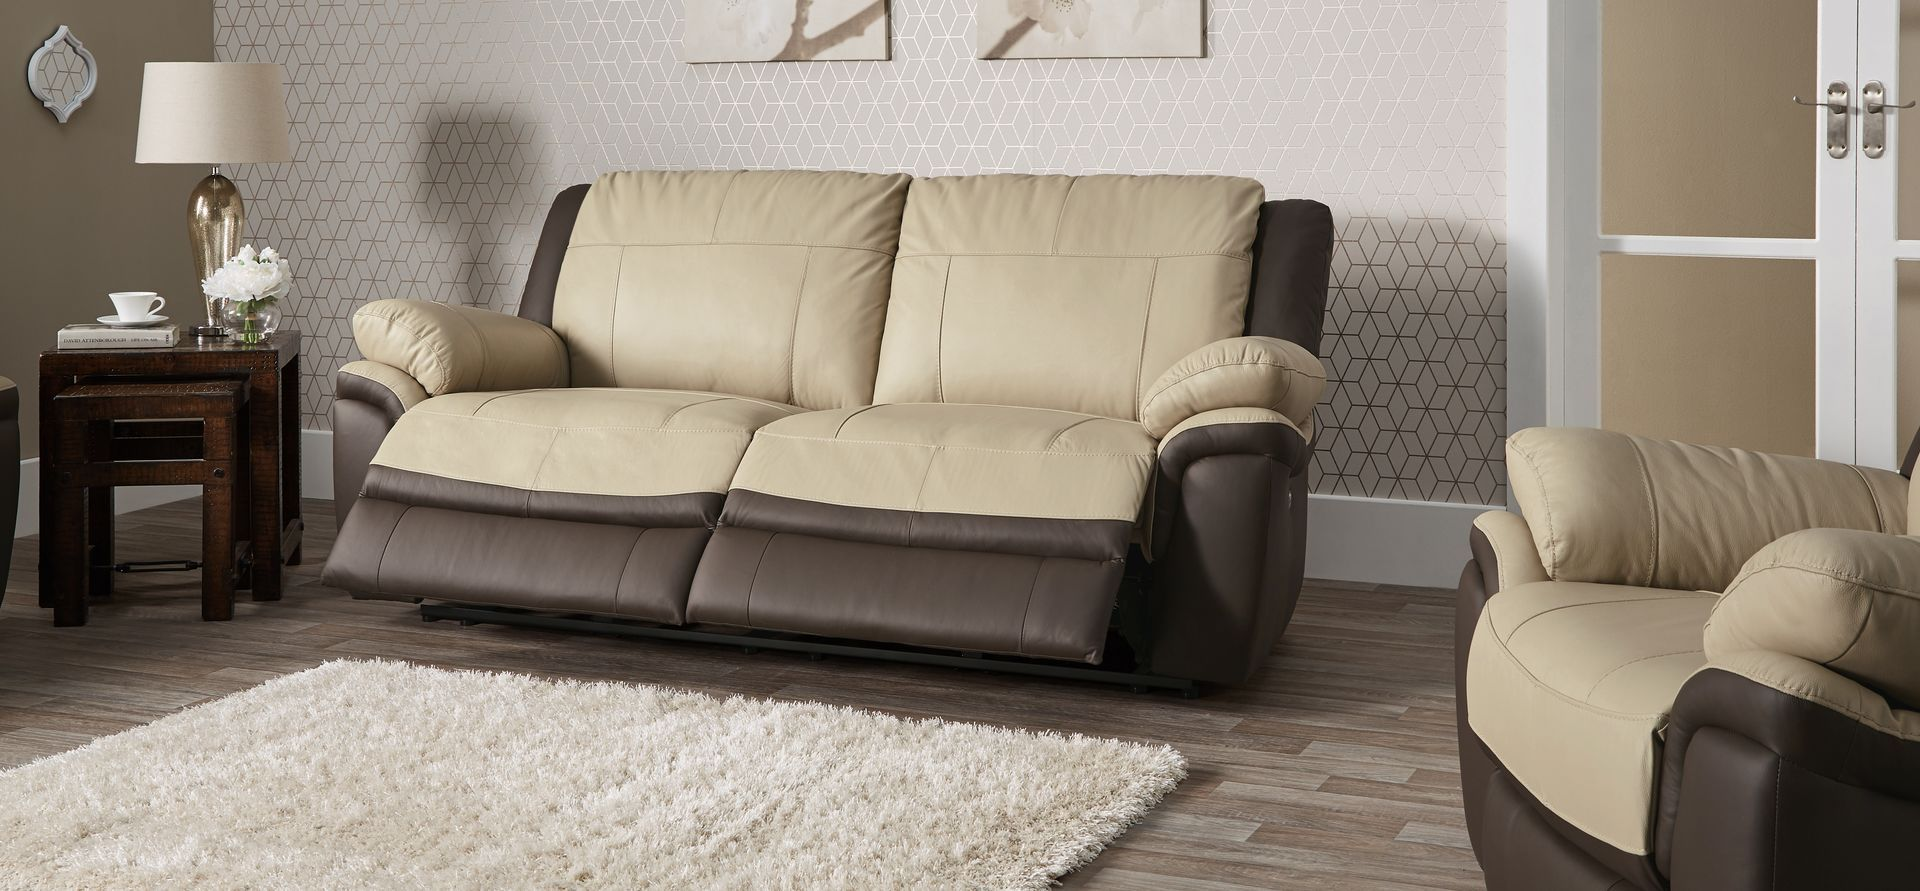 Peachy Aries 3 Seater Manual Recliner Sofa Furniture Kynsey Road Inzonedesignstudio Interior Chair Design Inzonedesignstudiocom